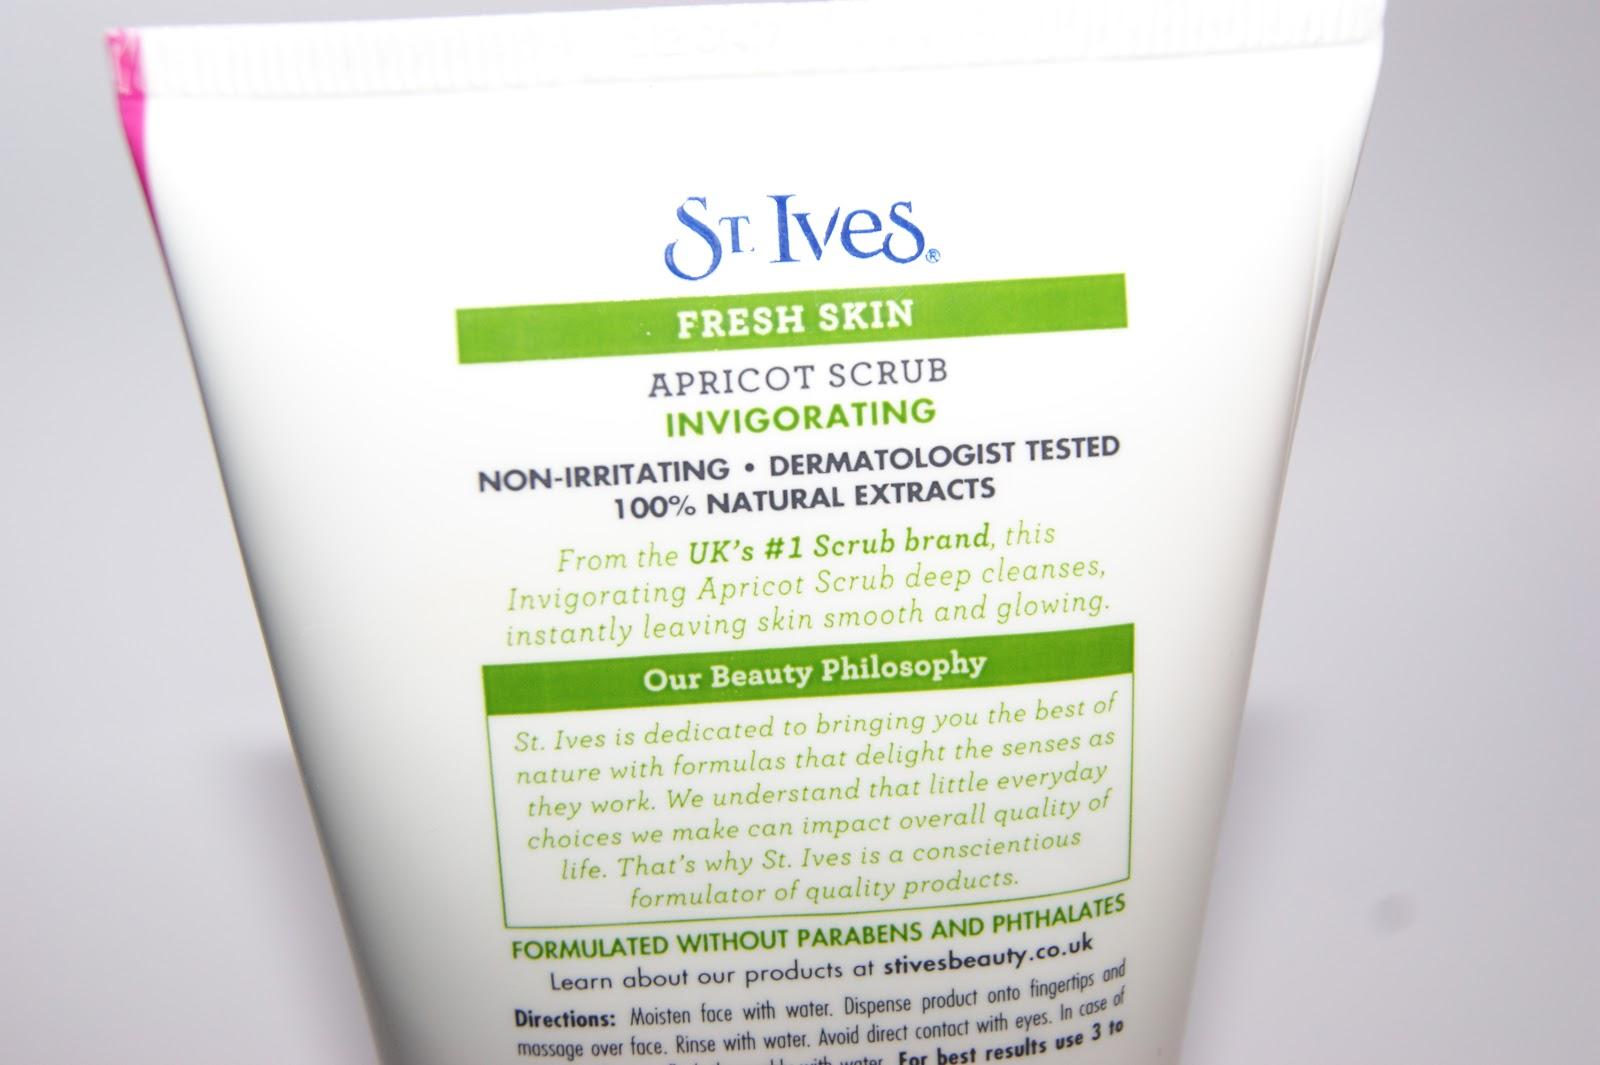 St Ives Bright Skin Apricot Scrub